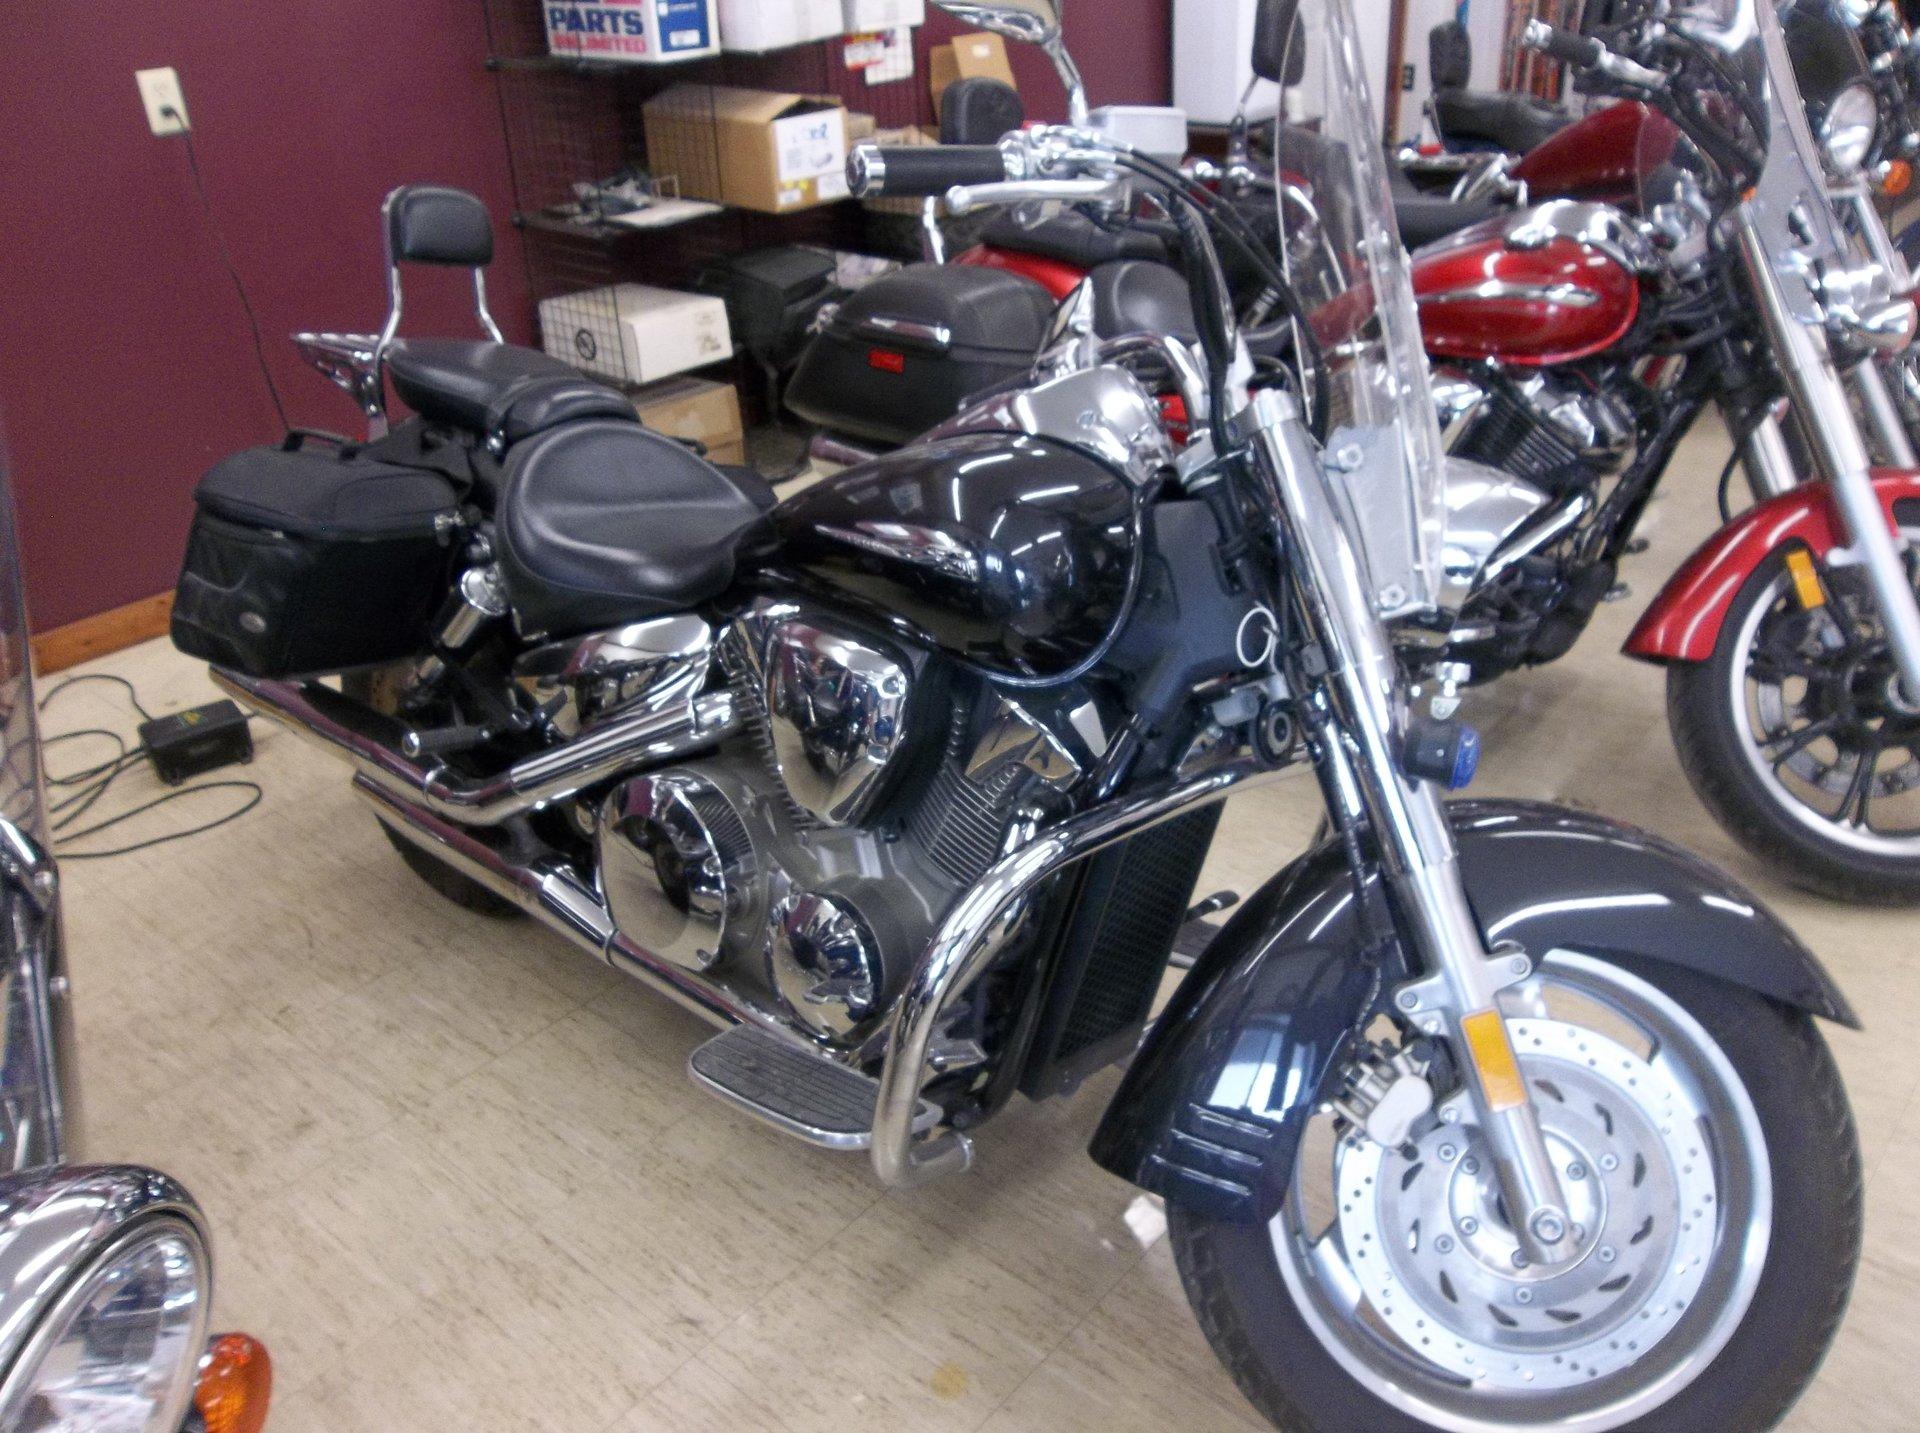 Motorcycle Services | Motorcycles | Maynard, IA